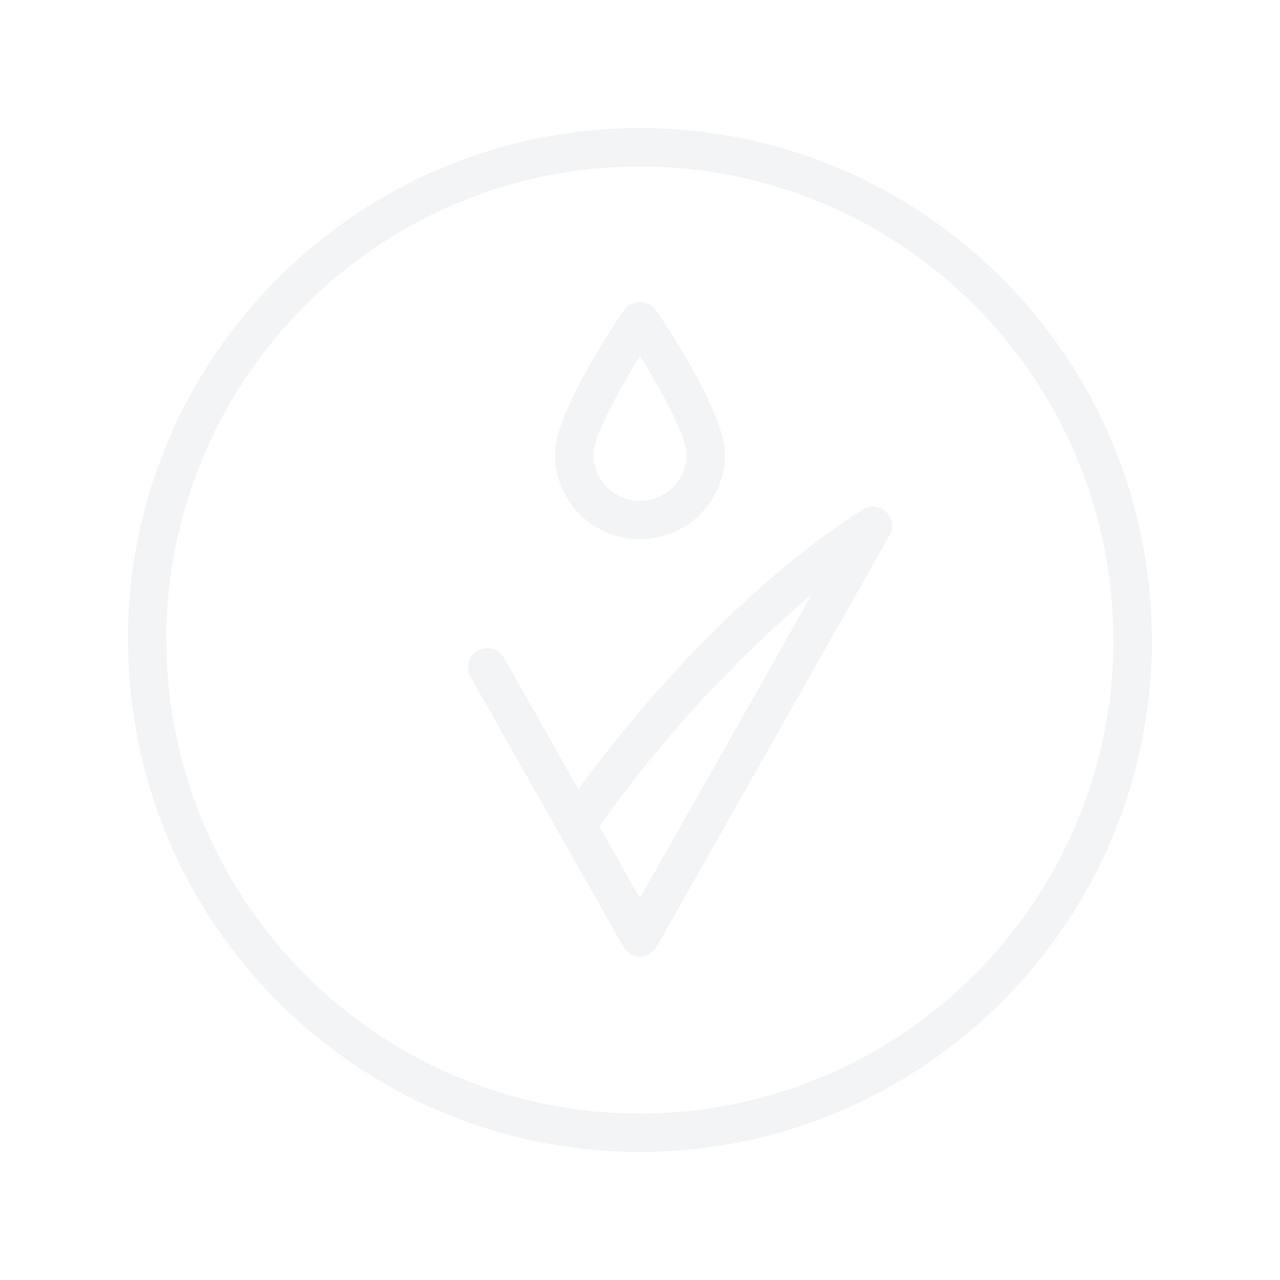 DIOR Flash Luminizer Pen 2.5ml